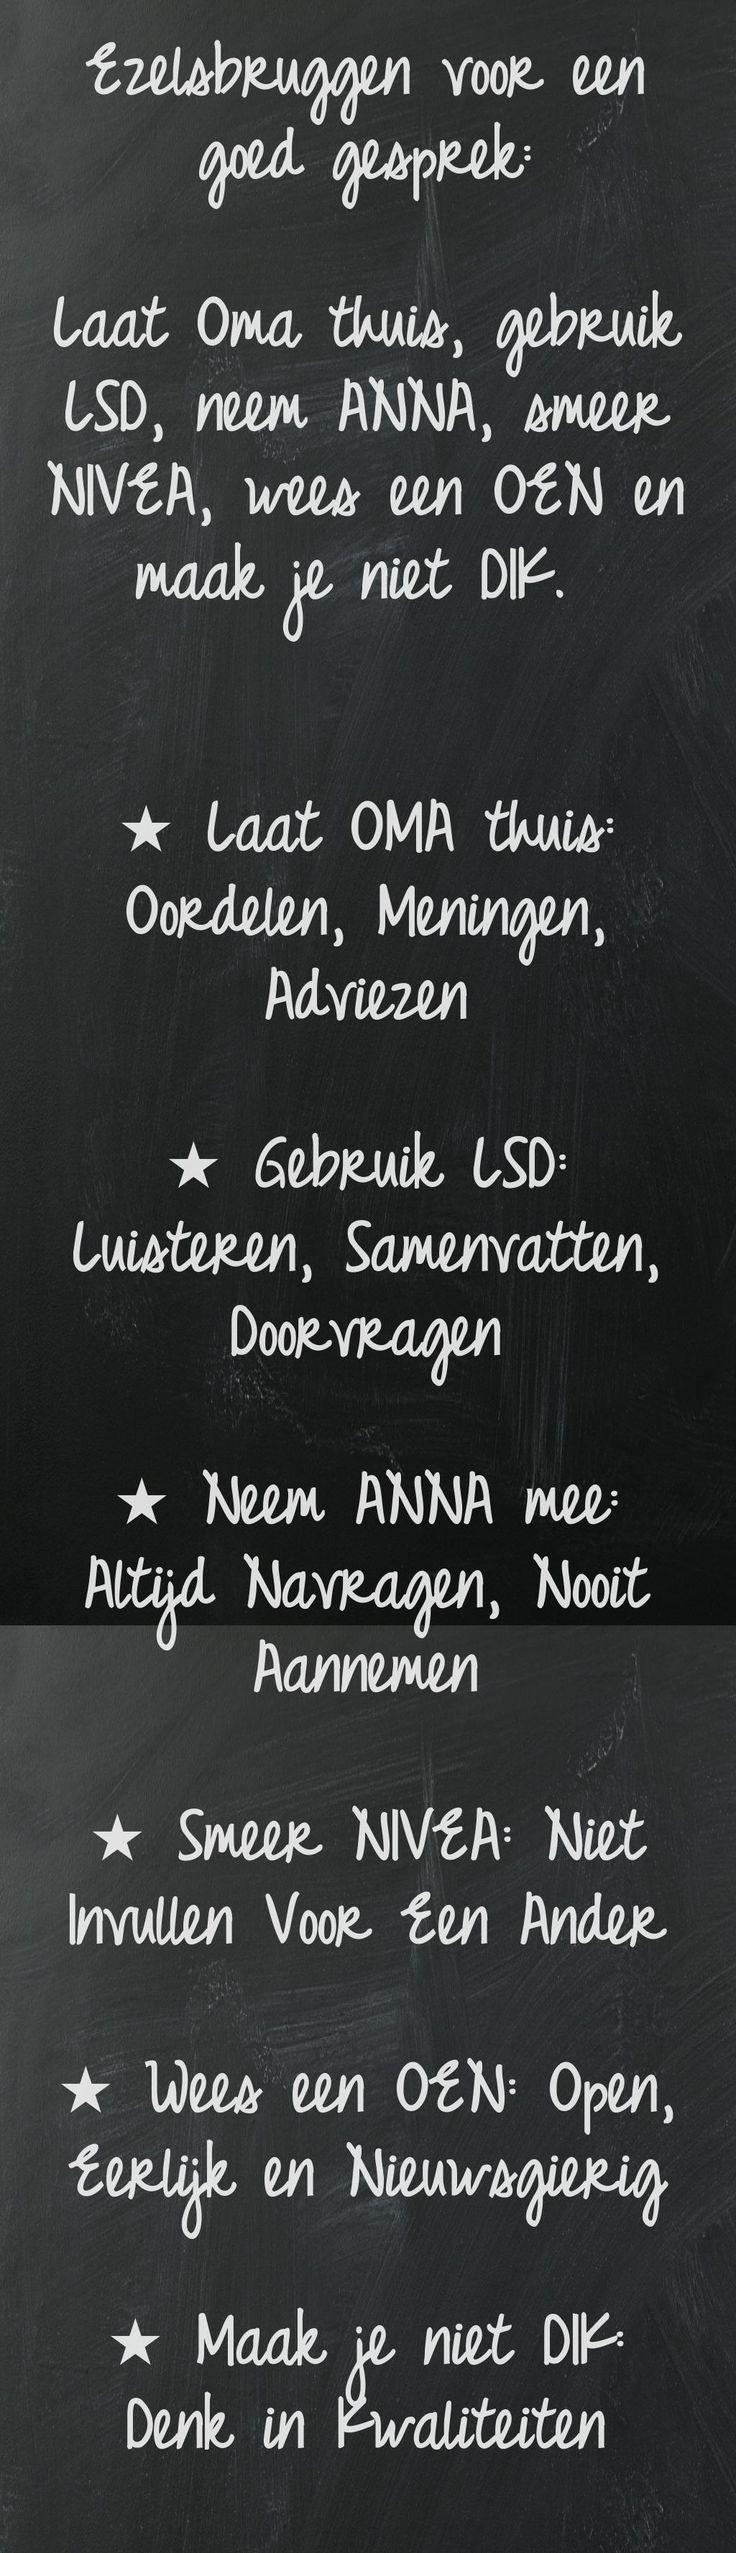 Een goed gesprek: OMA, NIVEA, LSD, ANNA, OEN en DIK